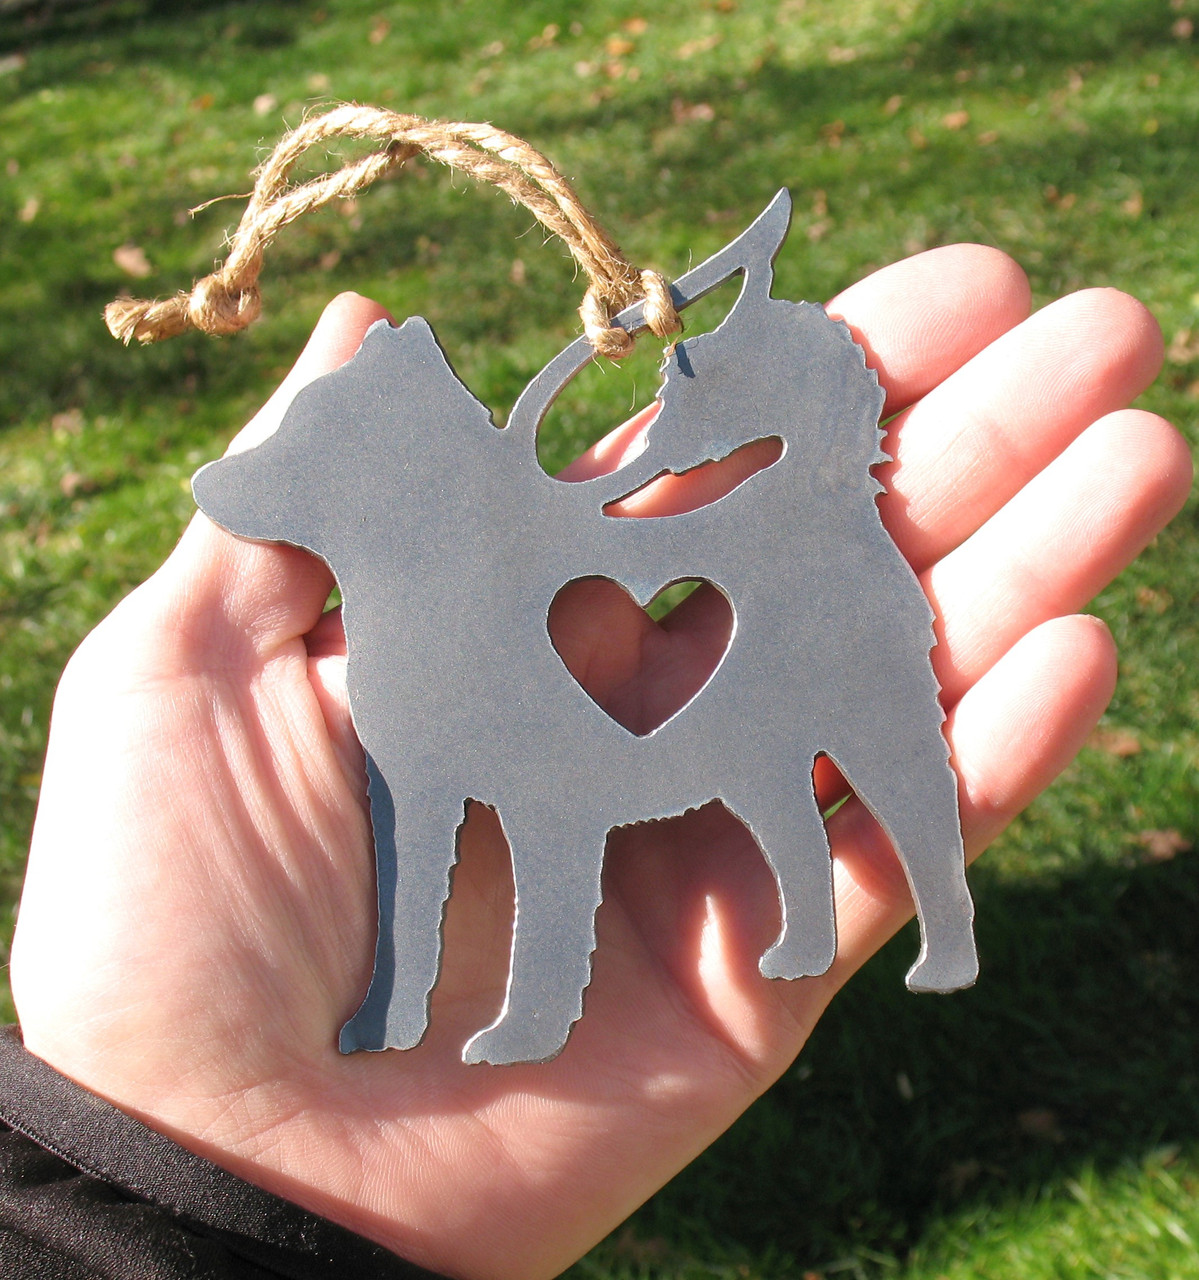 Alaskan Malamute Pet Loss Gift Ornament Angel - Pet Memorial - Dog Sympathy Remembrance Gift - Metal Dog Christmas Ornament